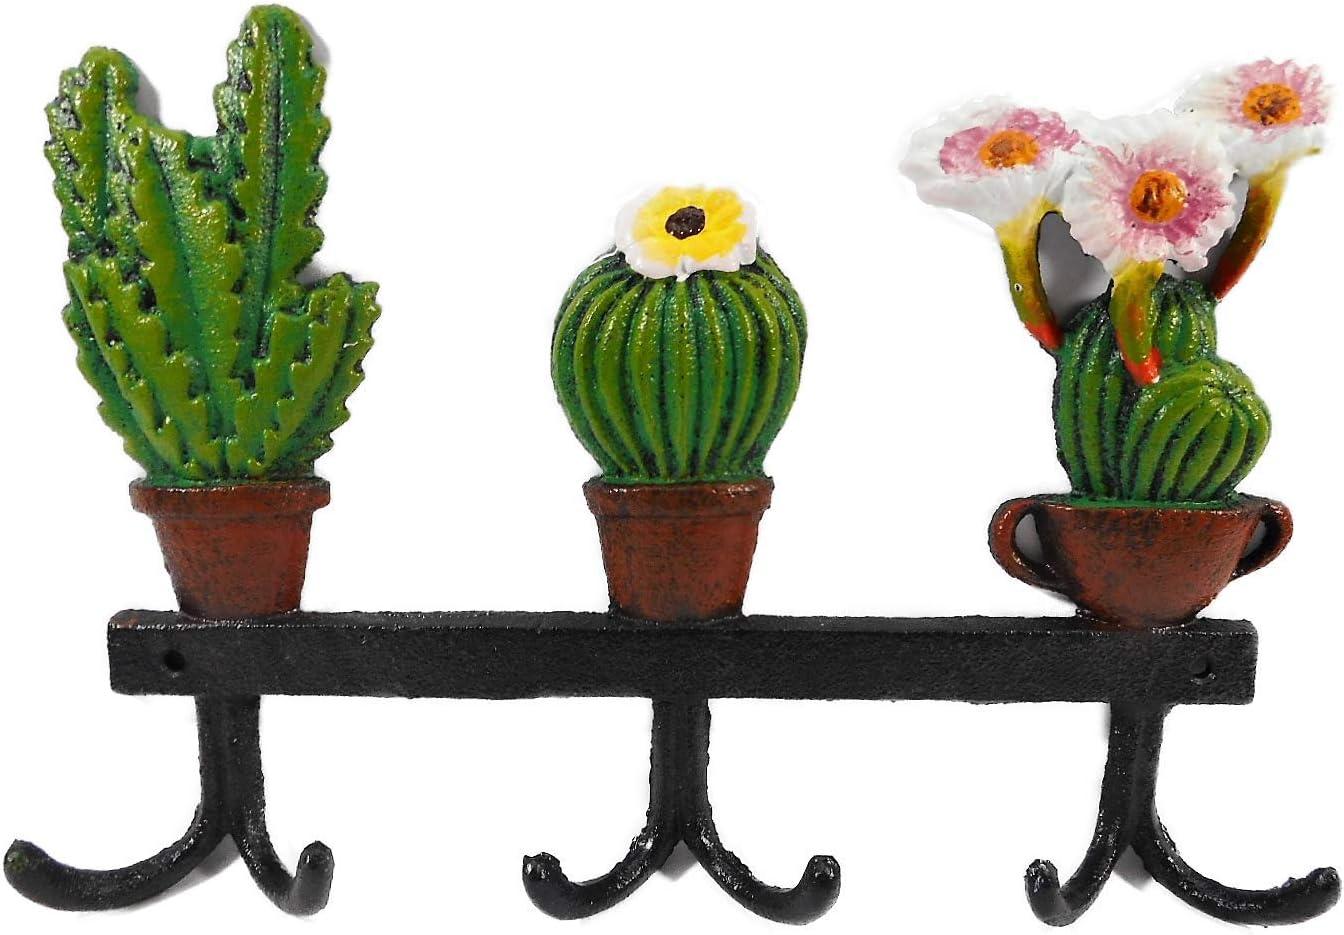 Gusseisen GGR D30 - Perchero (18 x 26 cm, Hierro Fundido), diseño de Cactus